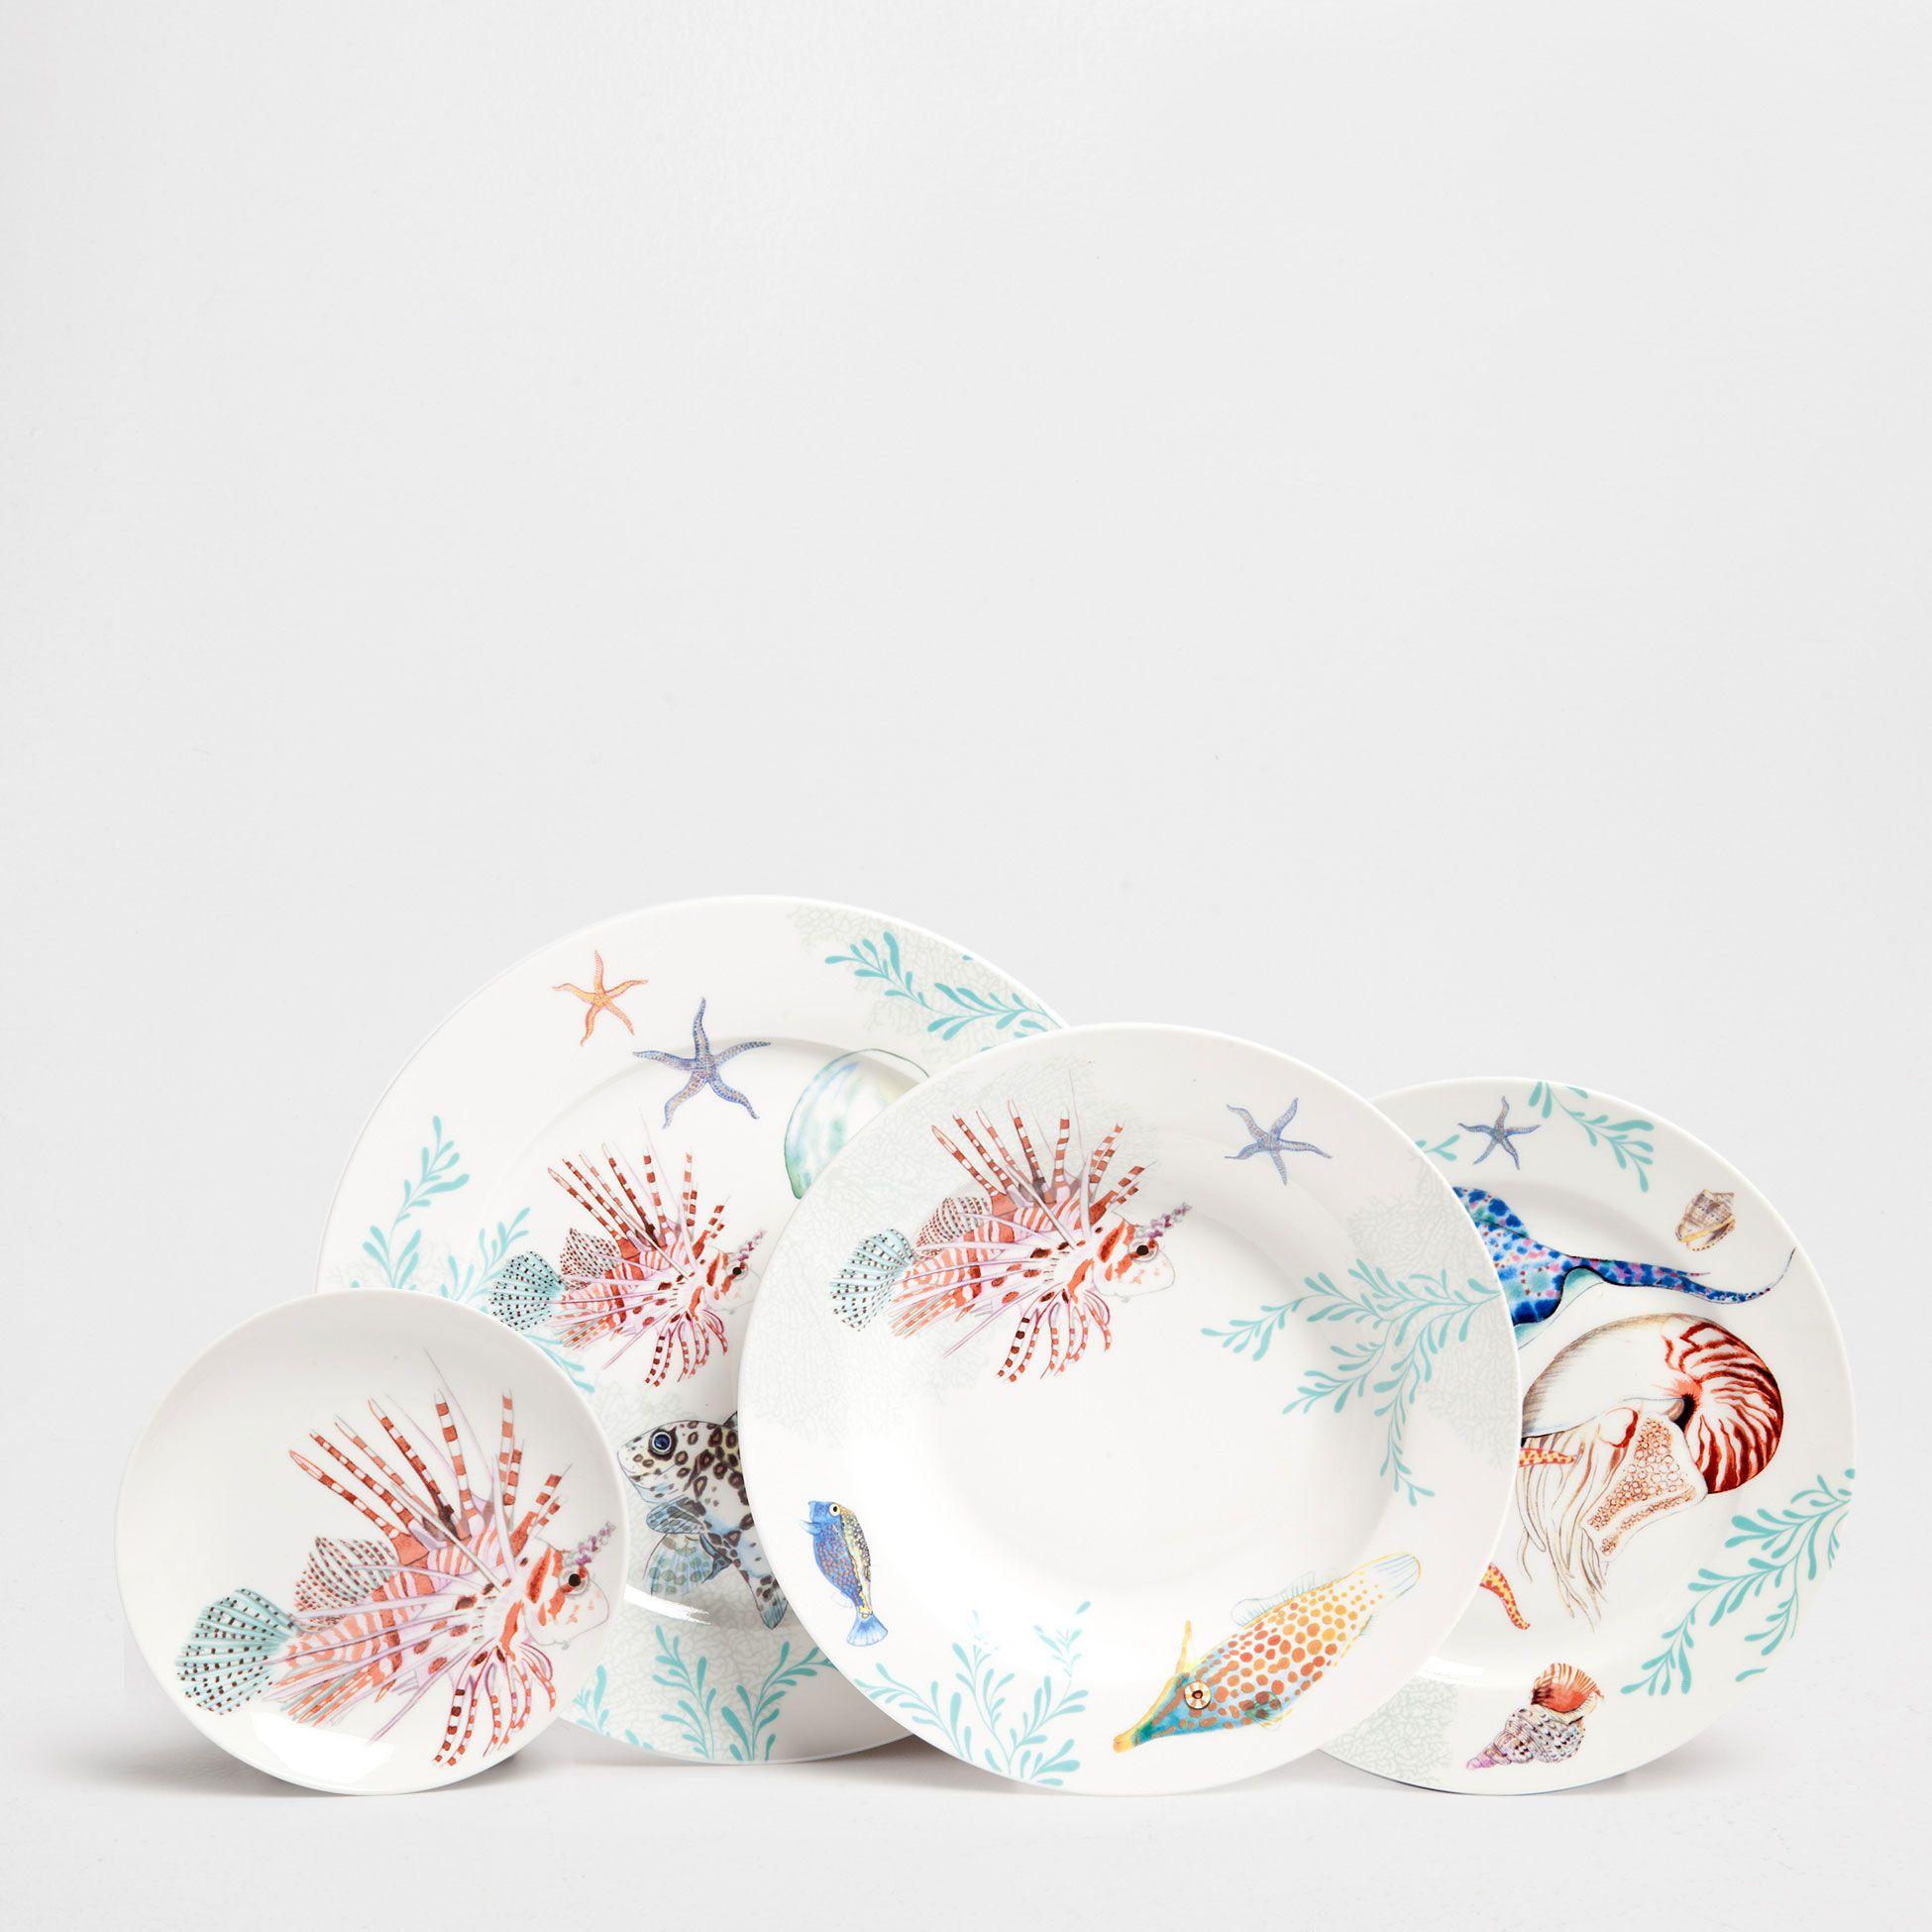 SEABED TABLEWARE - | Zara Home United States of America  sc 1 st  Pinterest & SEABED TABLEWARE - Dinnerware - Tableware | Zara Home United States ...